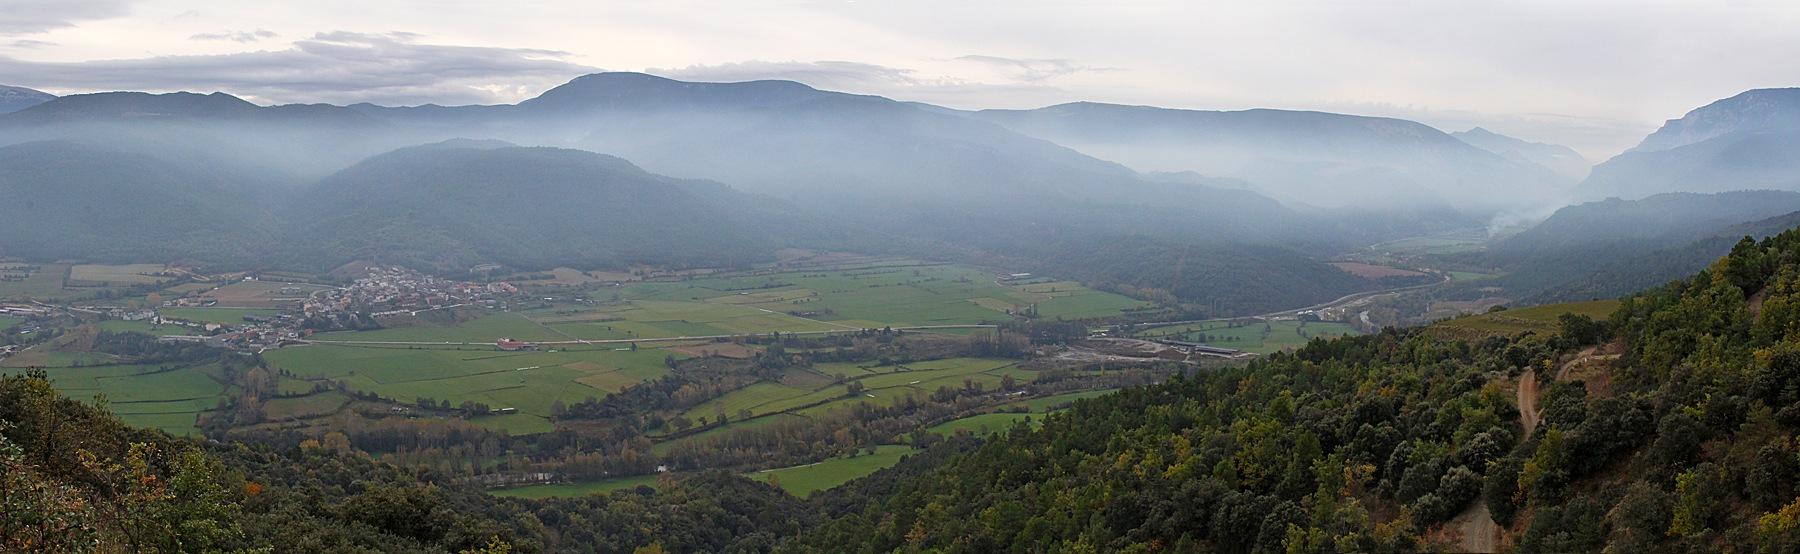 Morning Valley Panorama by Carl Main